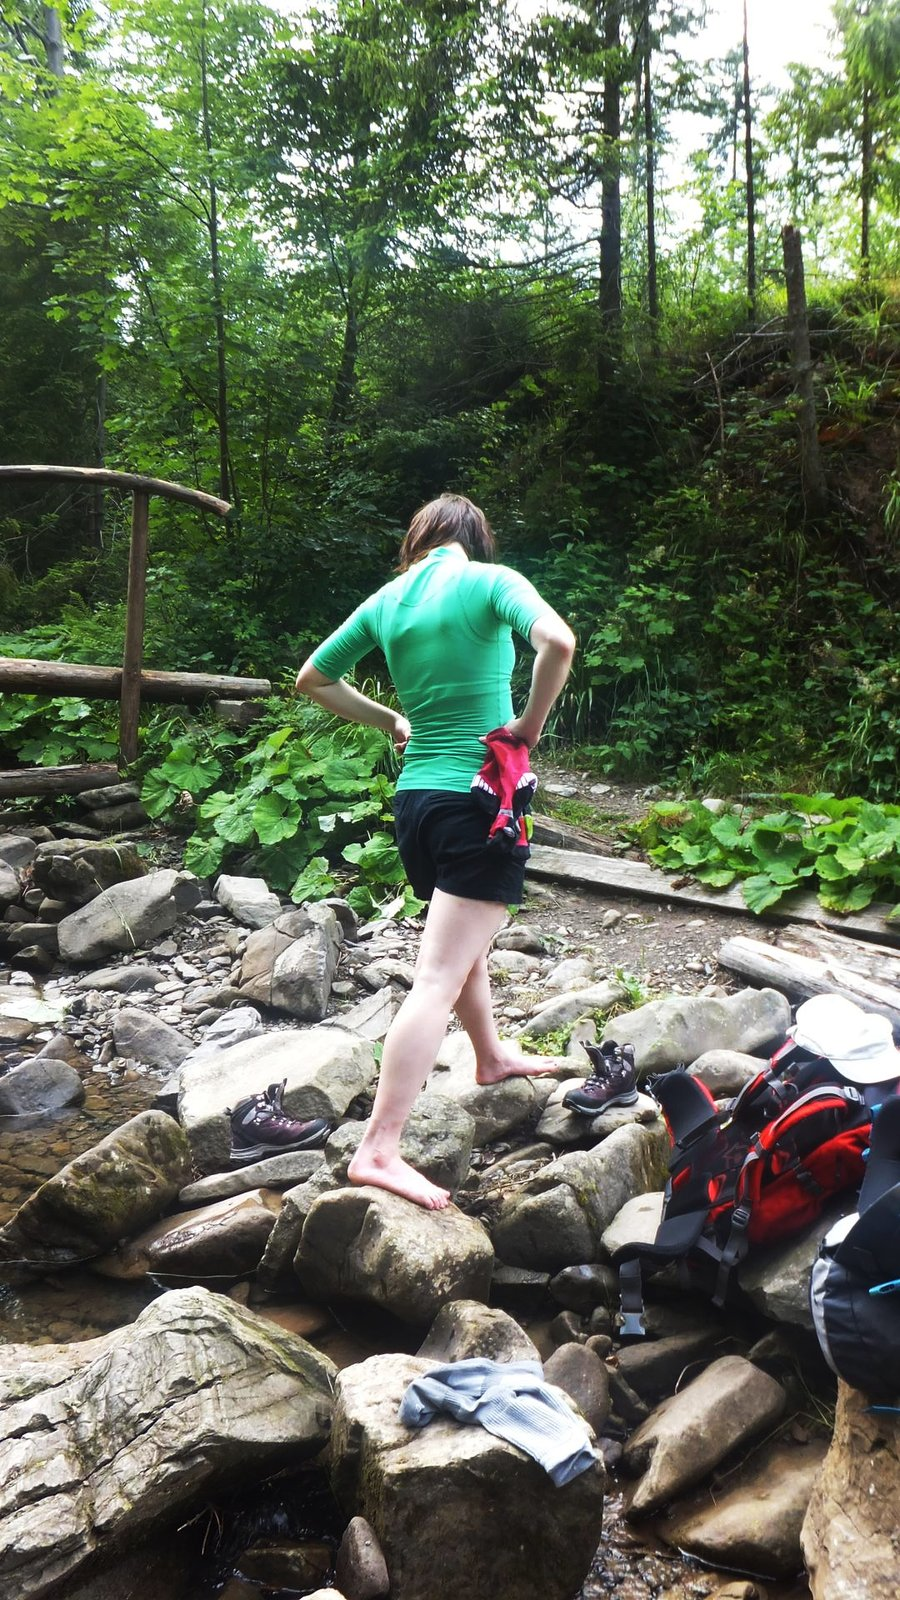 Hiking in Zywiec Beskid mountains, Poland